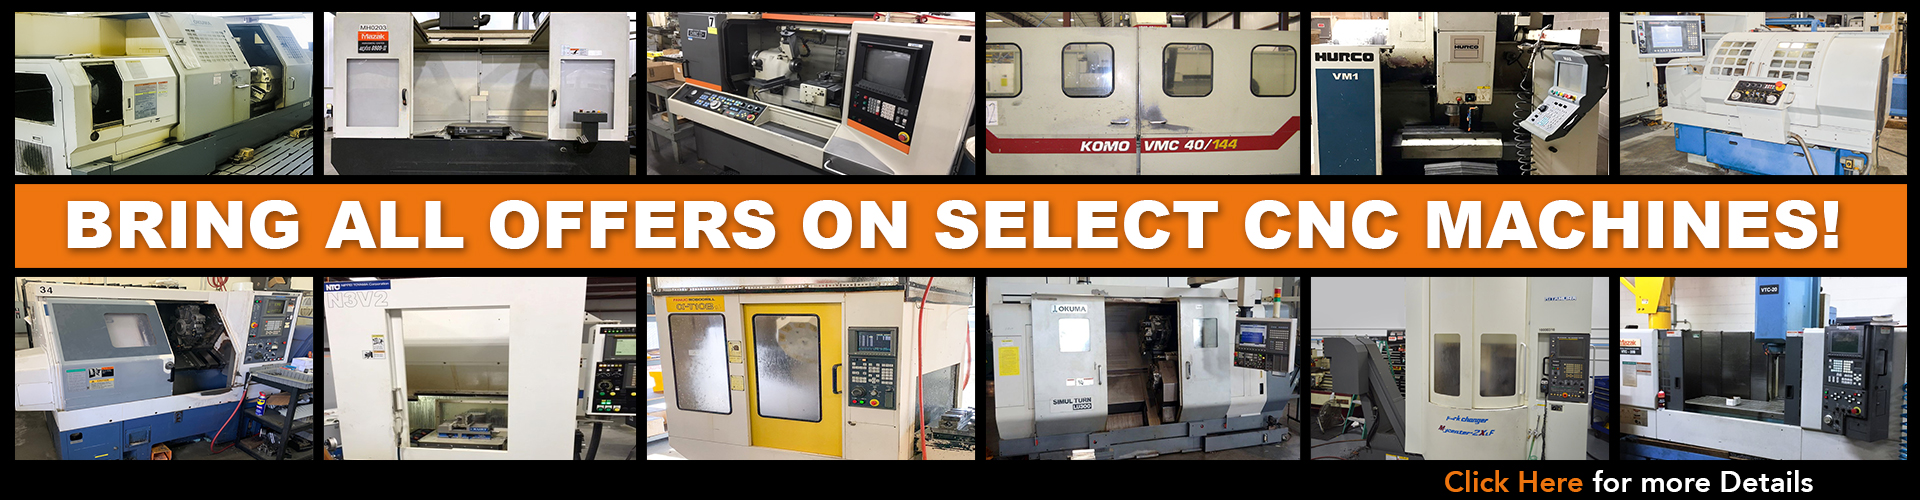 Resell CNC - Used CNC Machines & Used Mazak Lathes